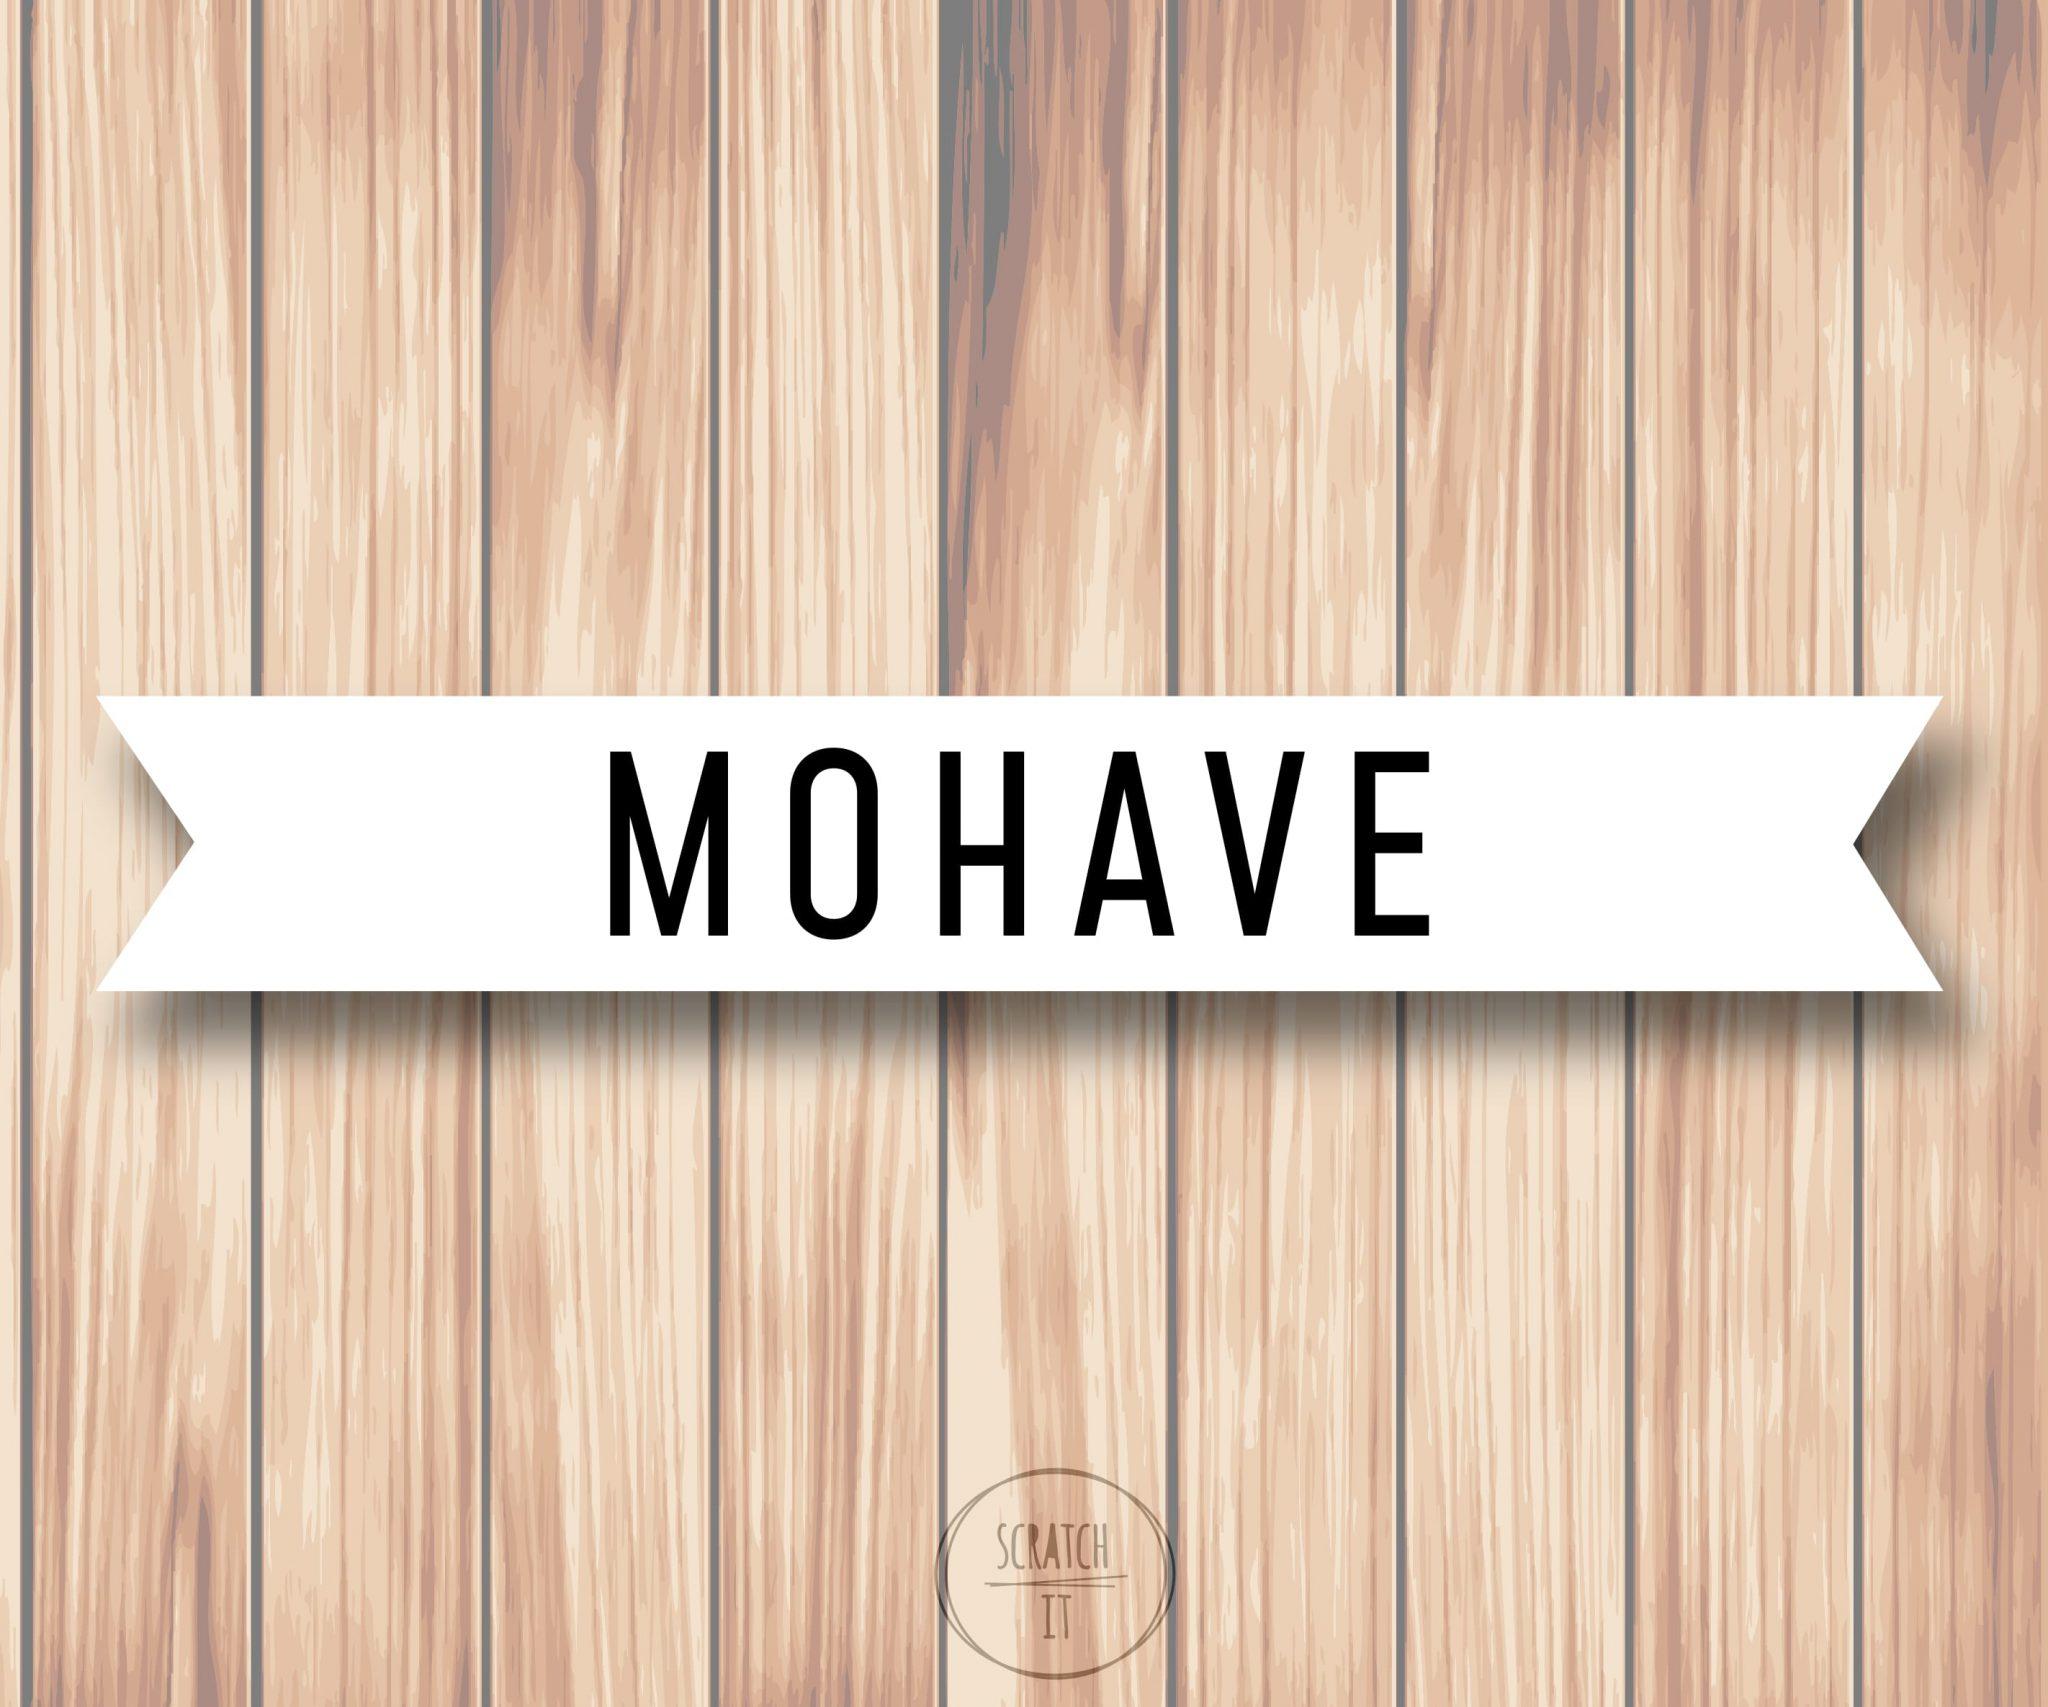 Białe winietki - flaga - MOHAVE